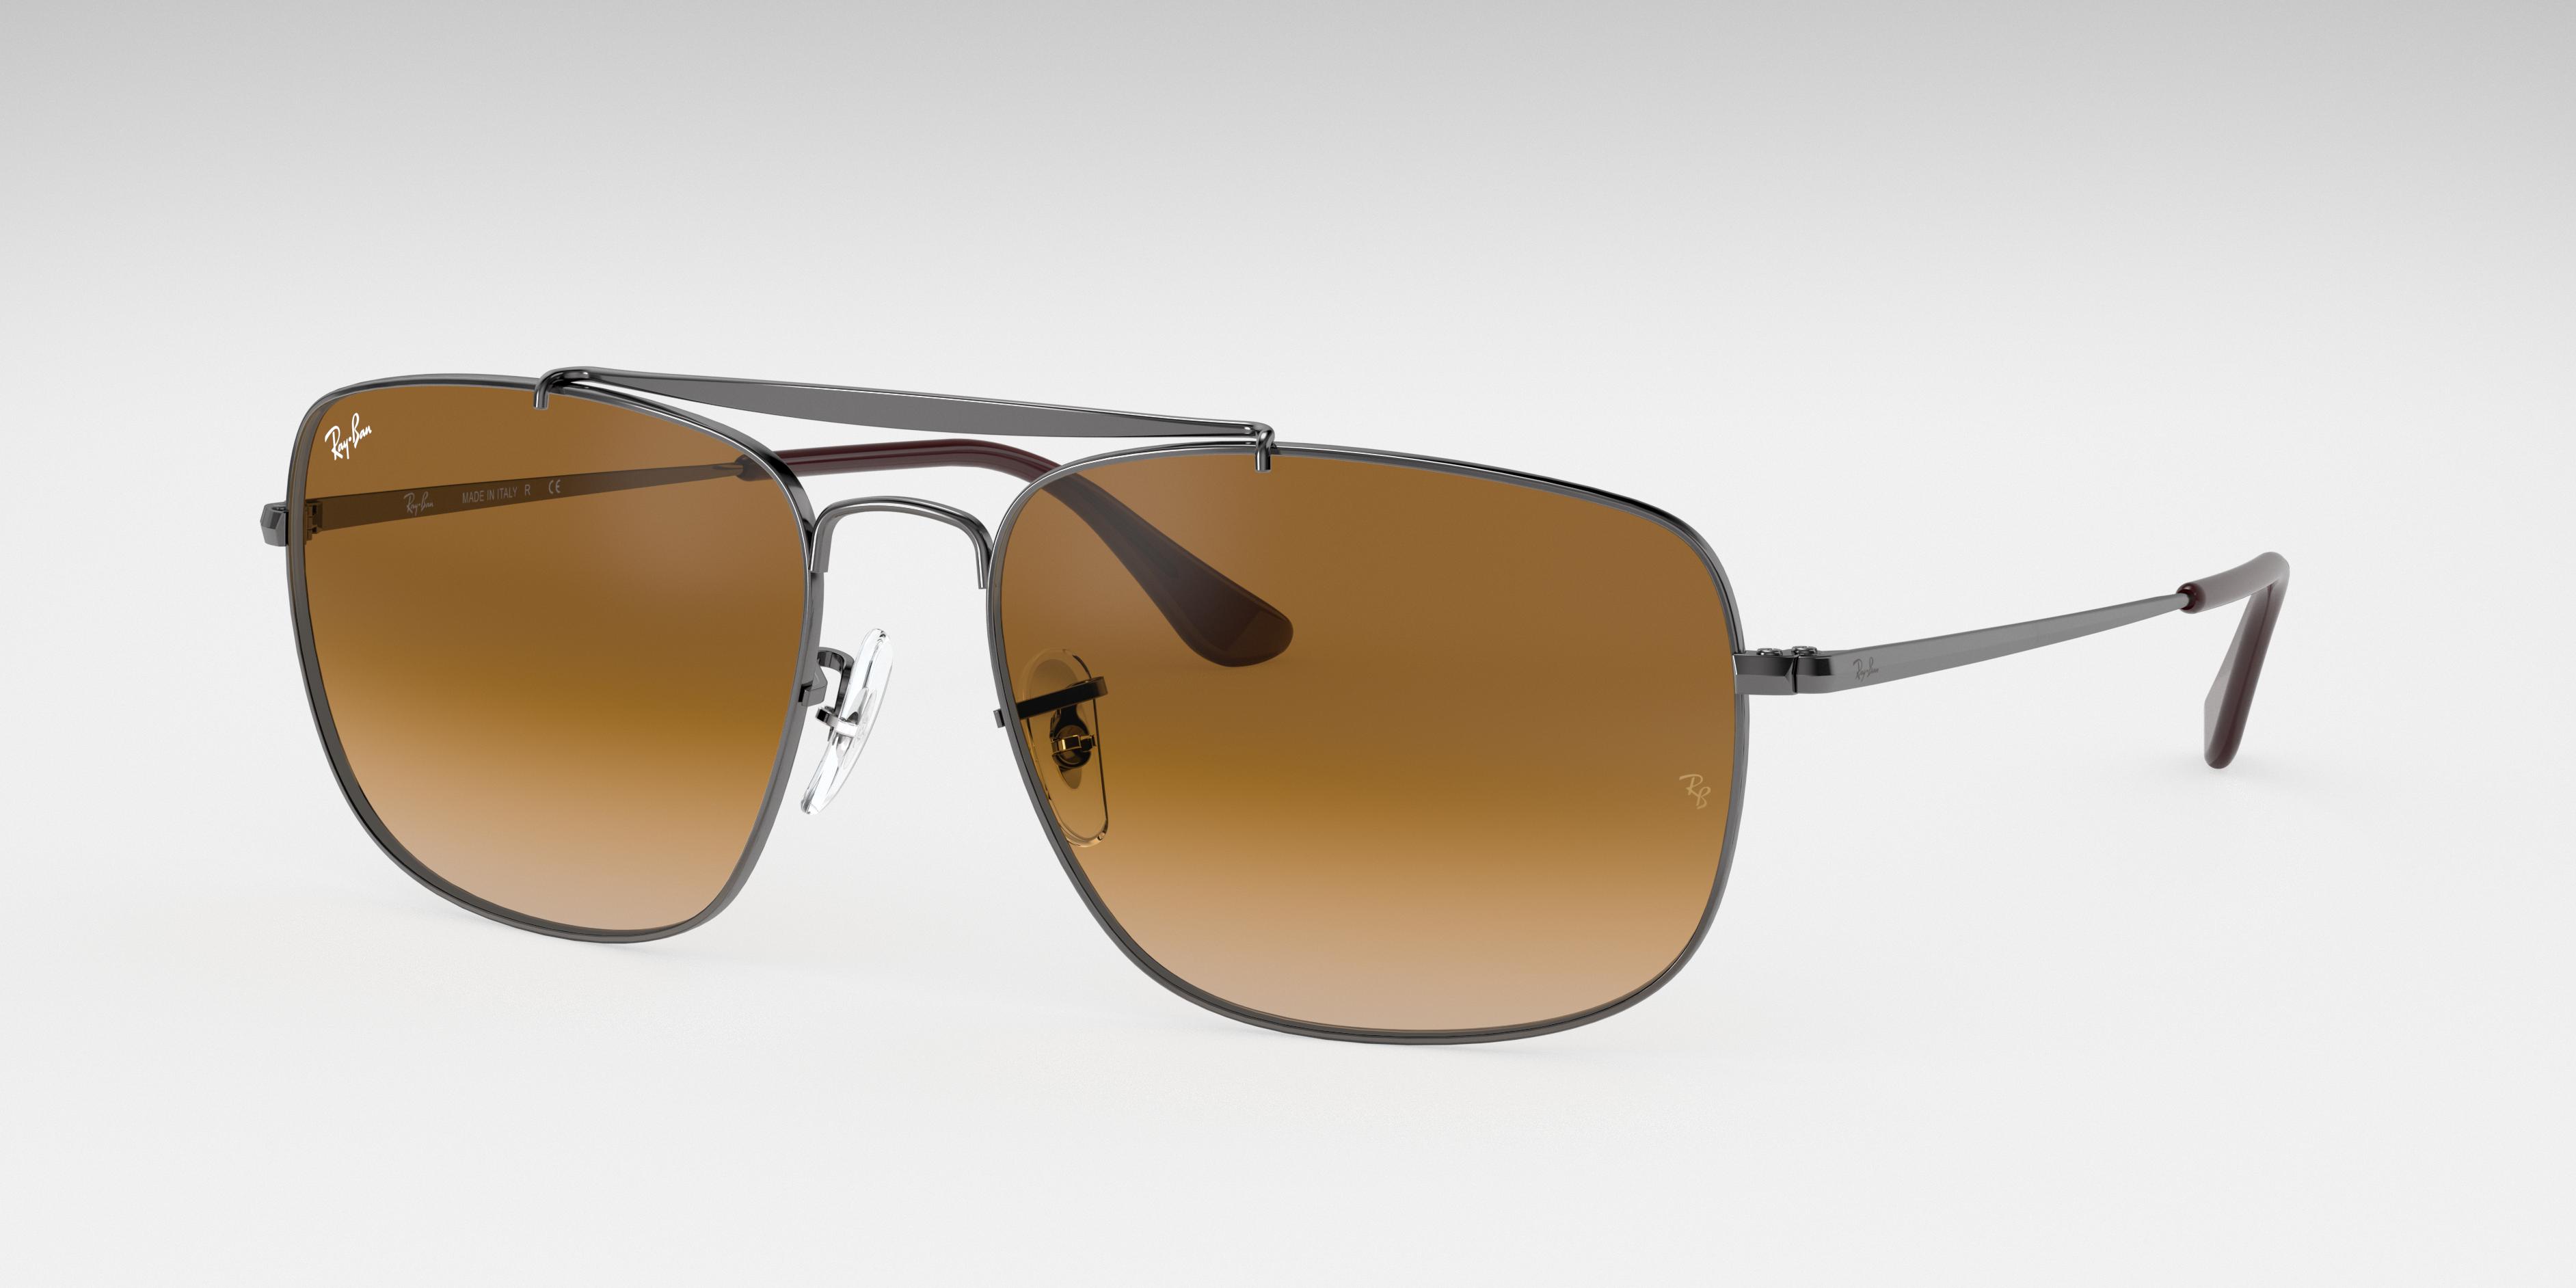 Ray-Ban Colonel Gunmetal, Brown Lenses - RB3560